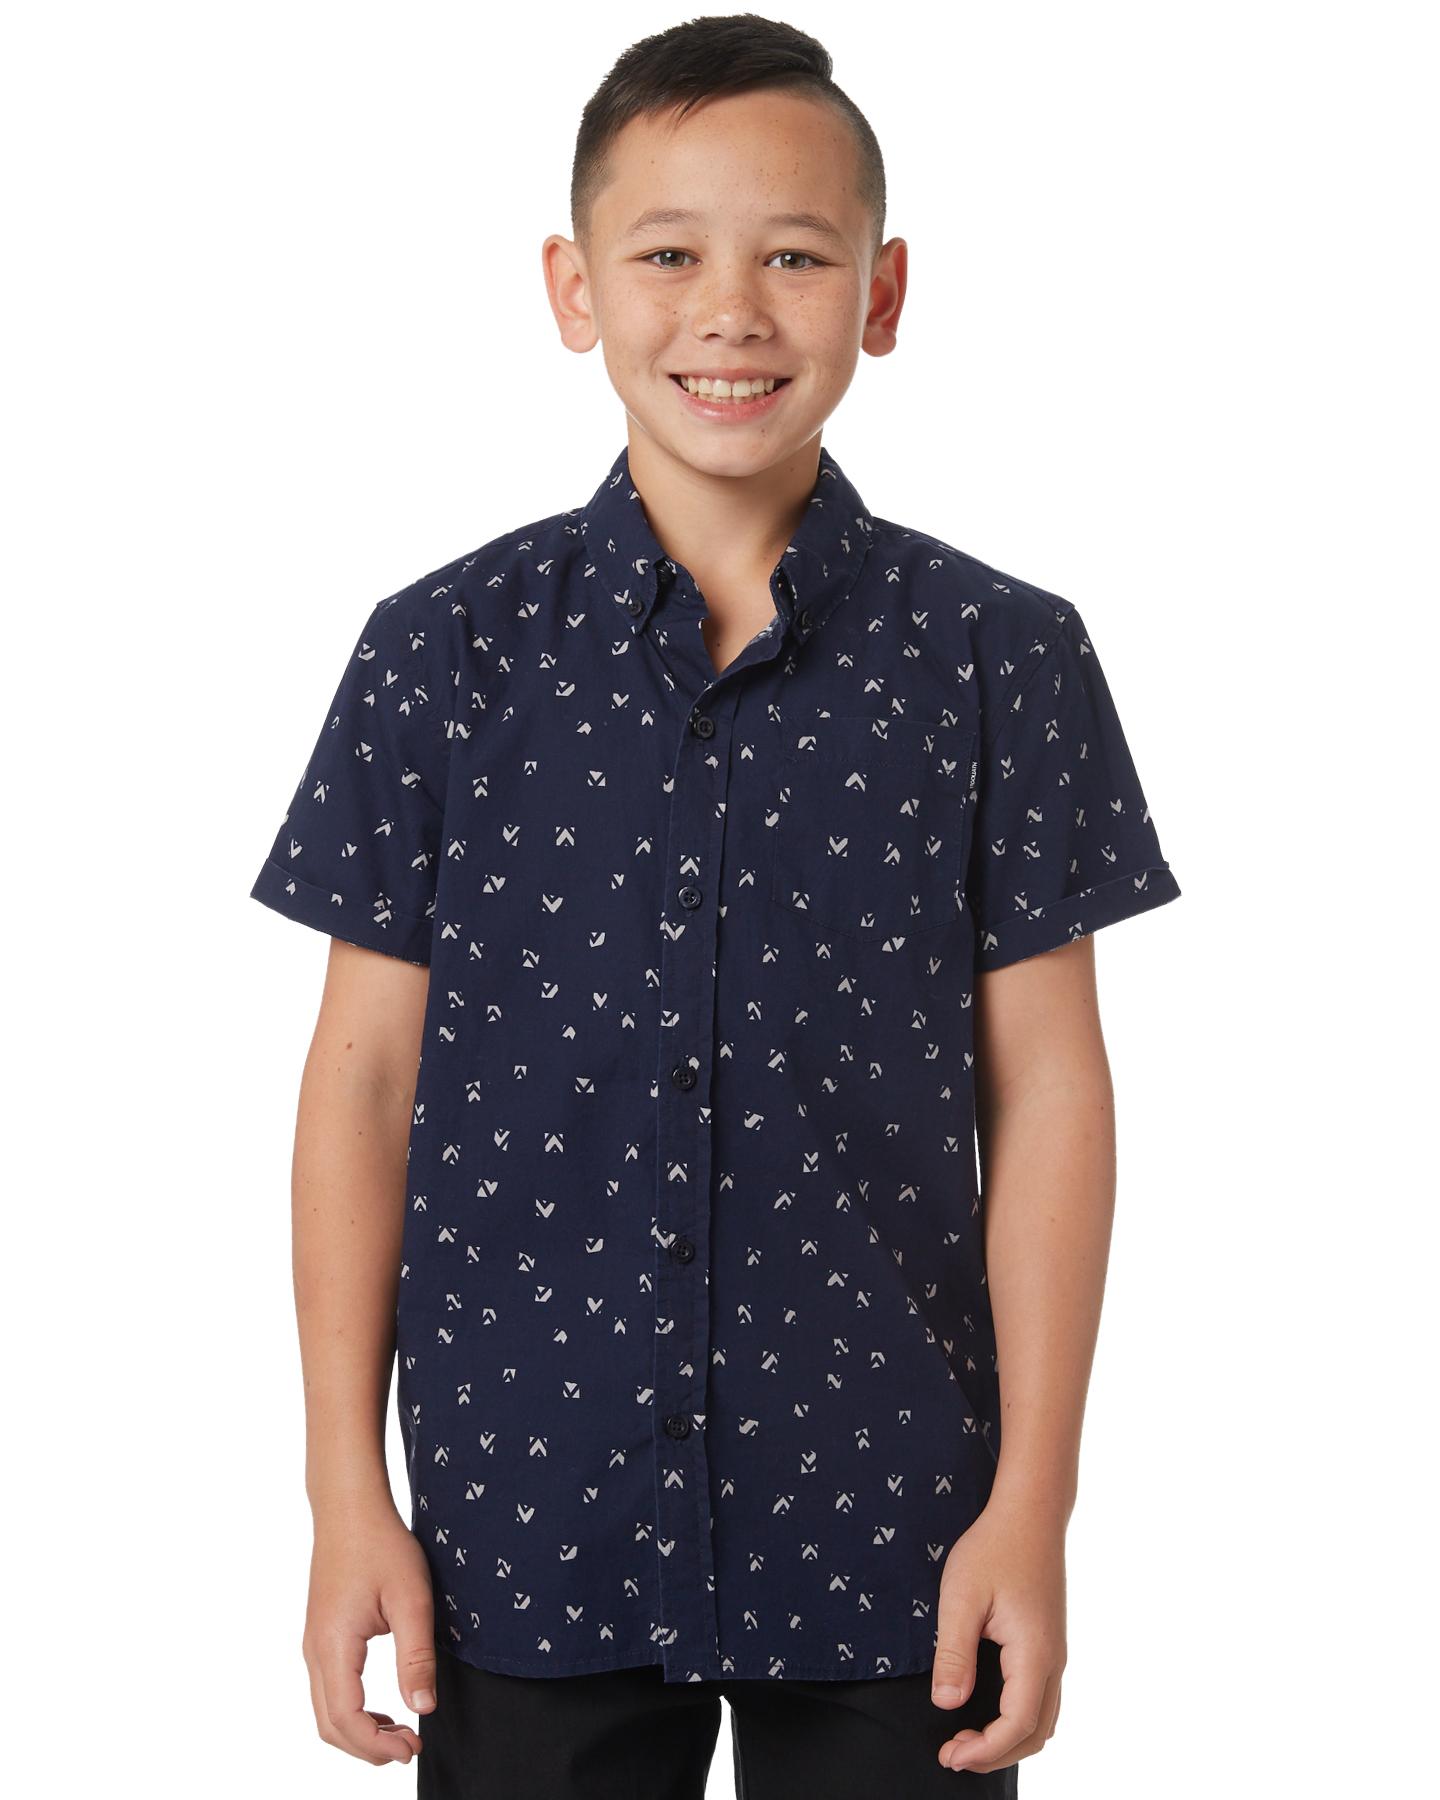 0fc2ceab8 St Goliath Kids Boys Worn Ss Shirt Navy Navy Childrens shirts Size ...